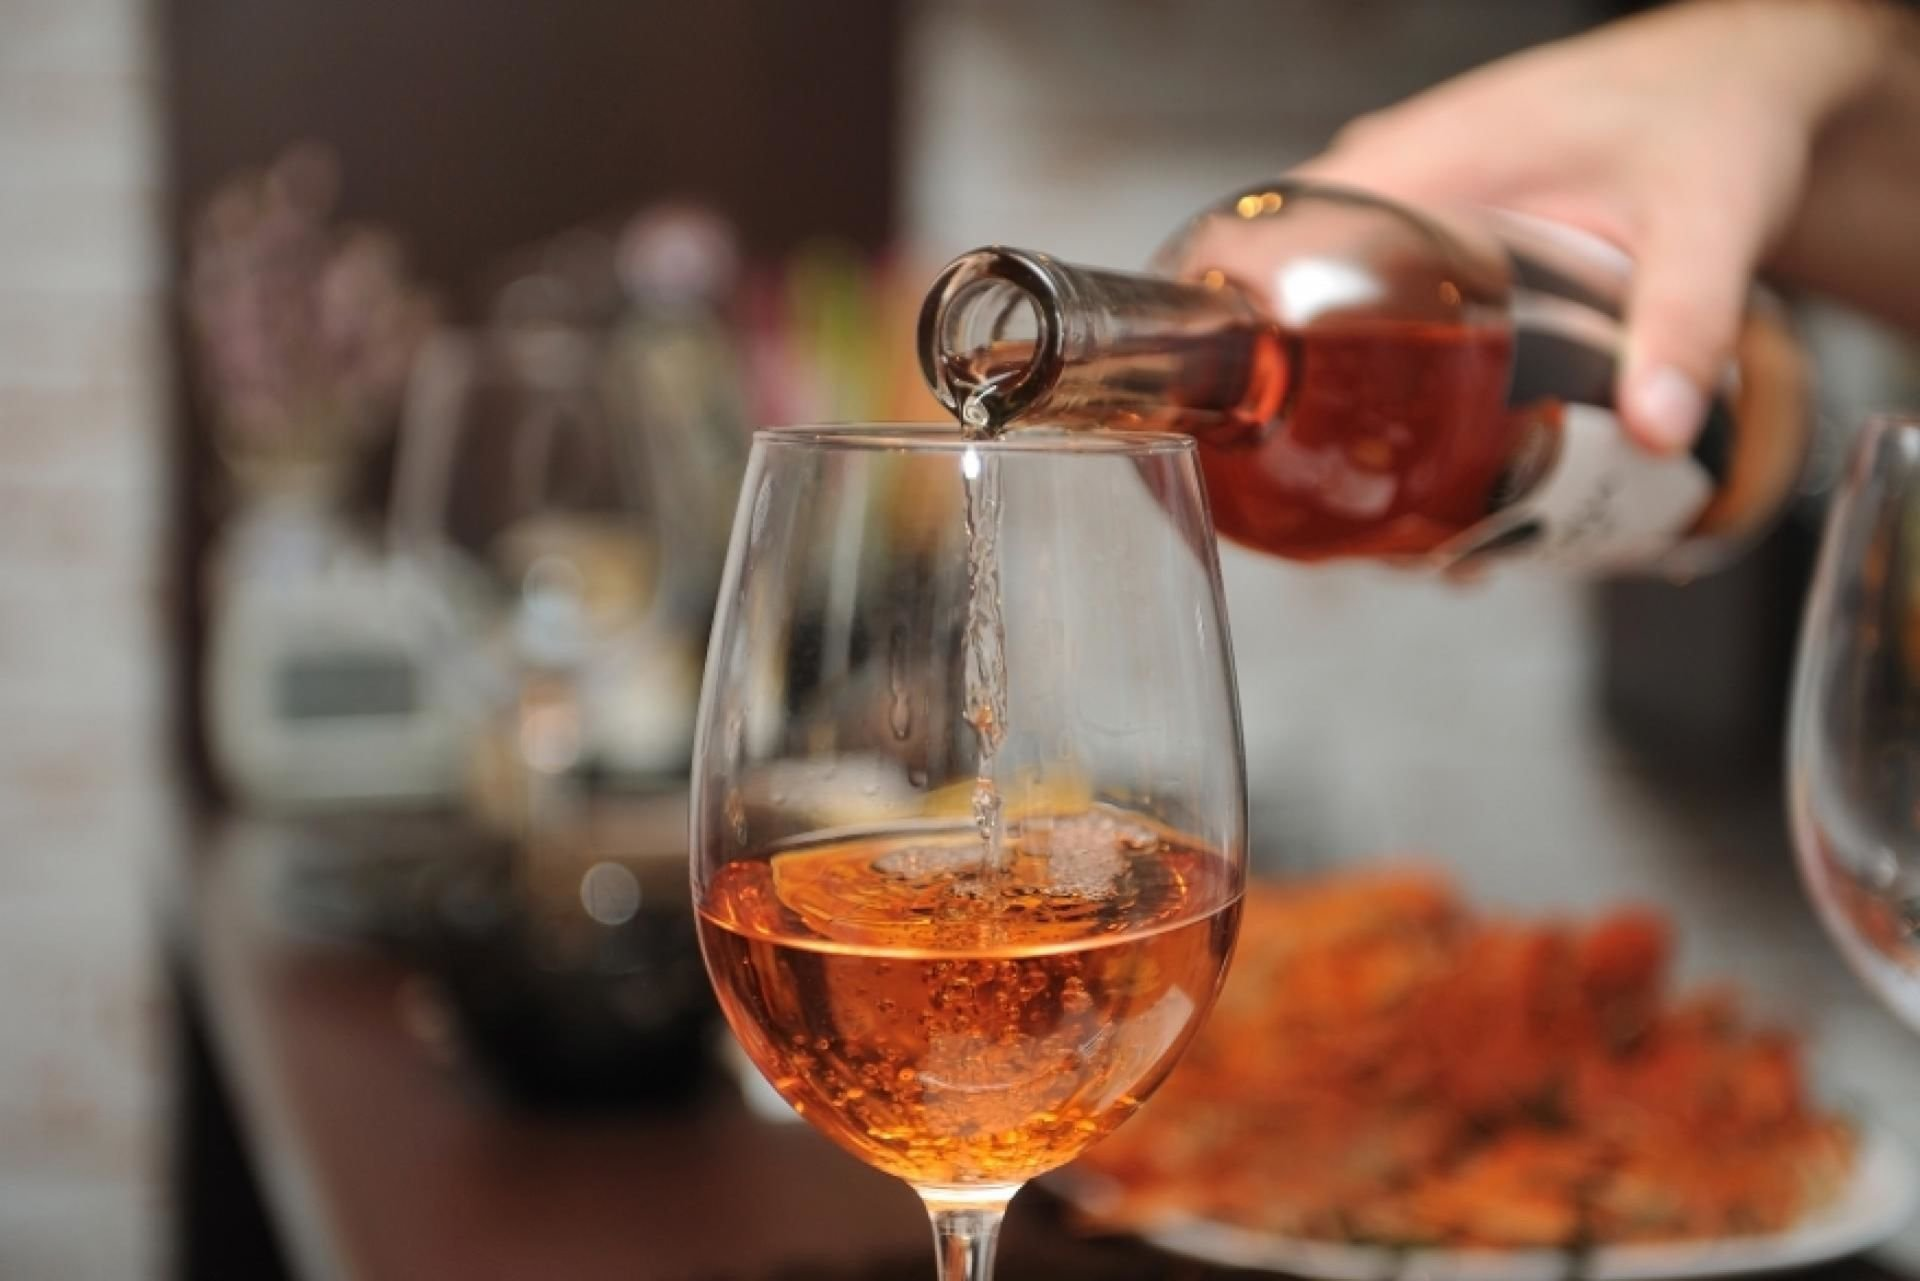 Лунный календарь алкоголя на октябрь: